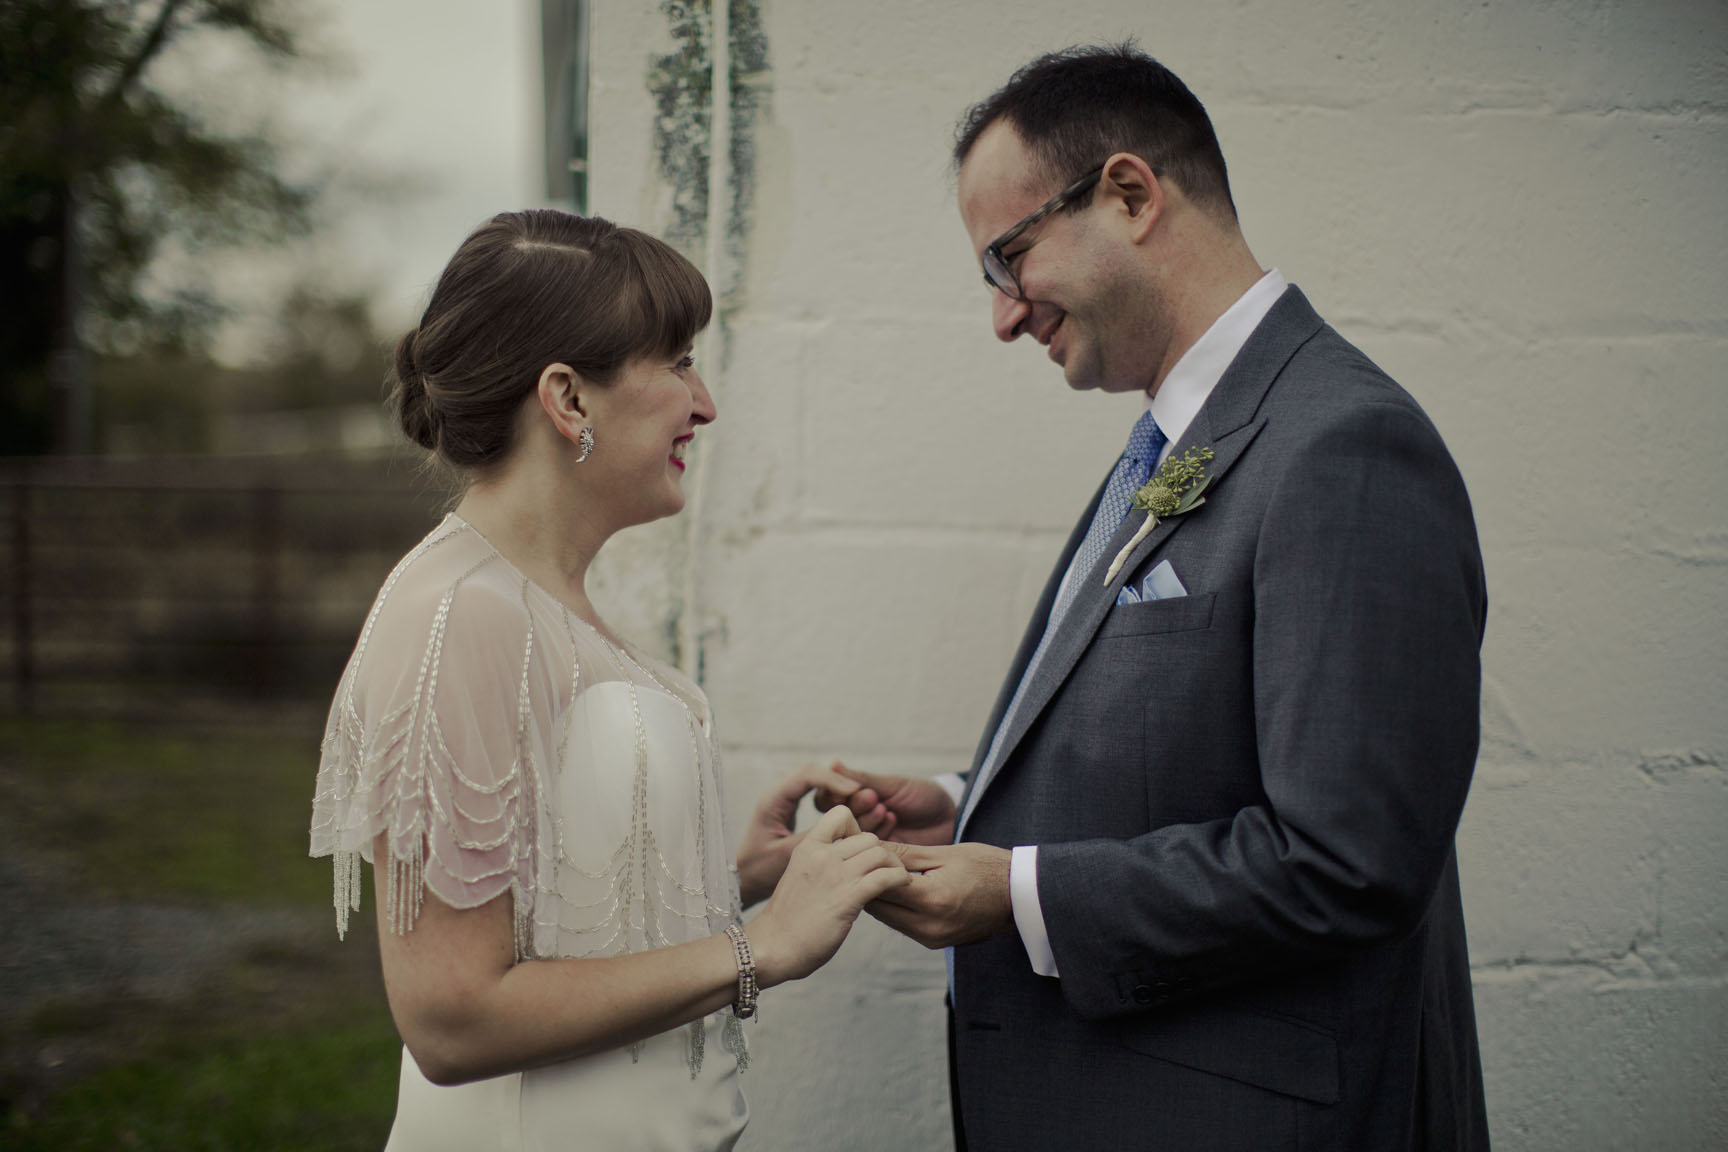 SGP_Alison&Dave_TheStory053